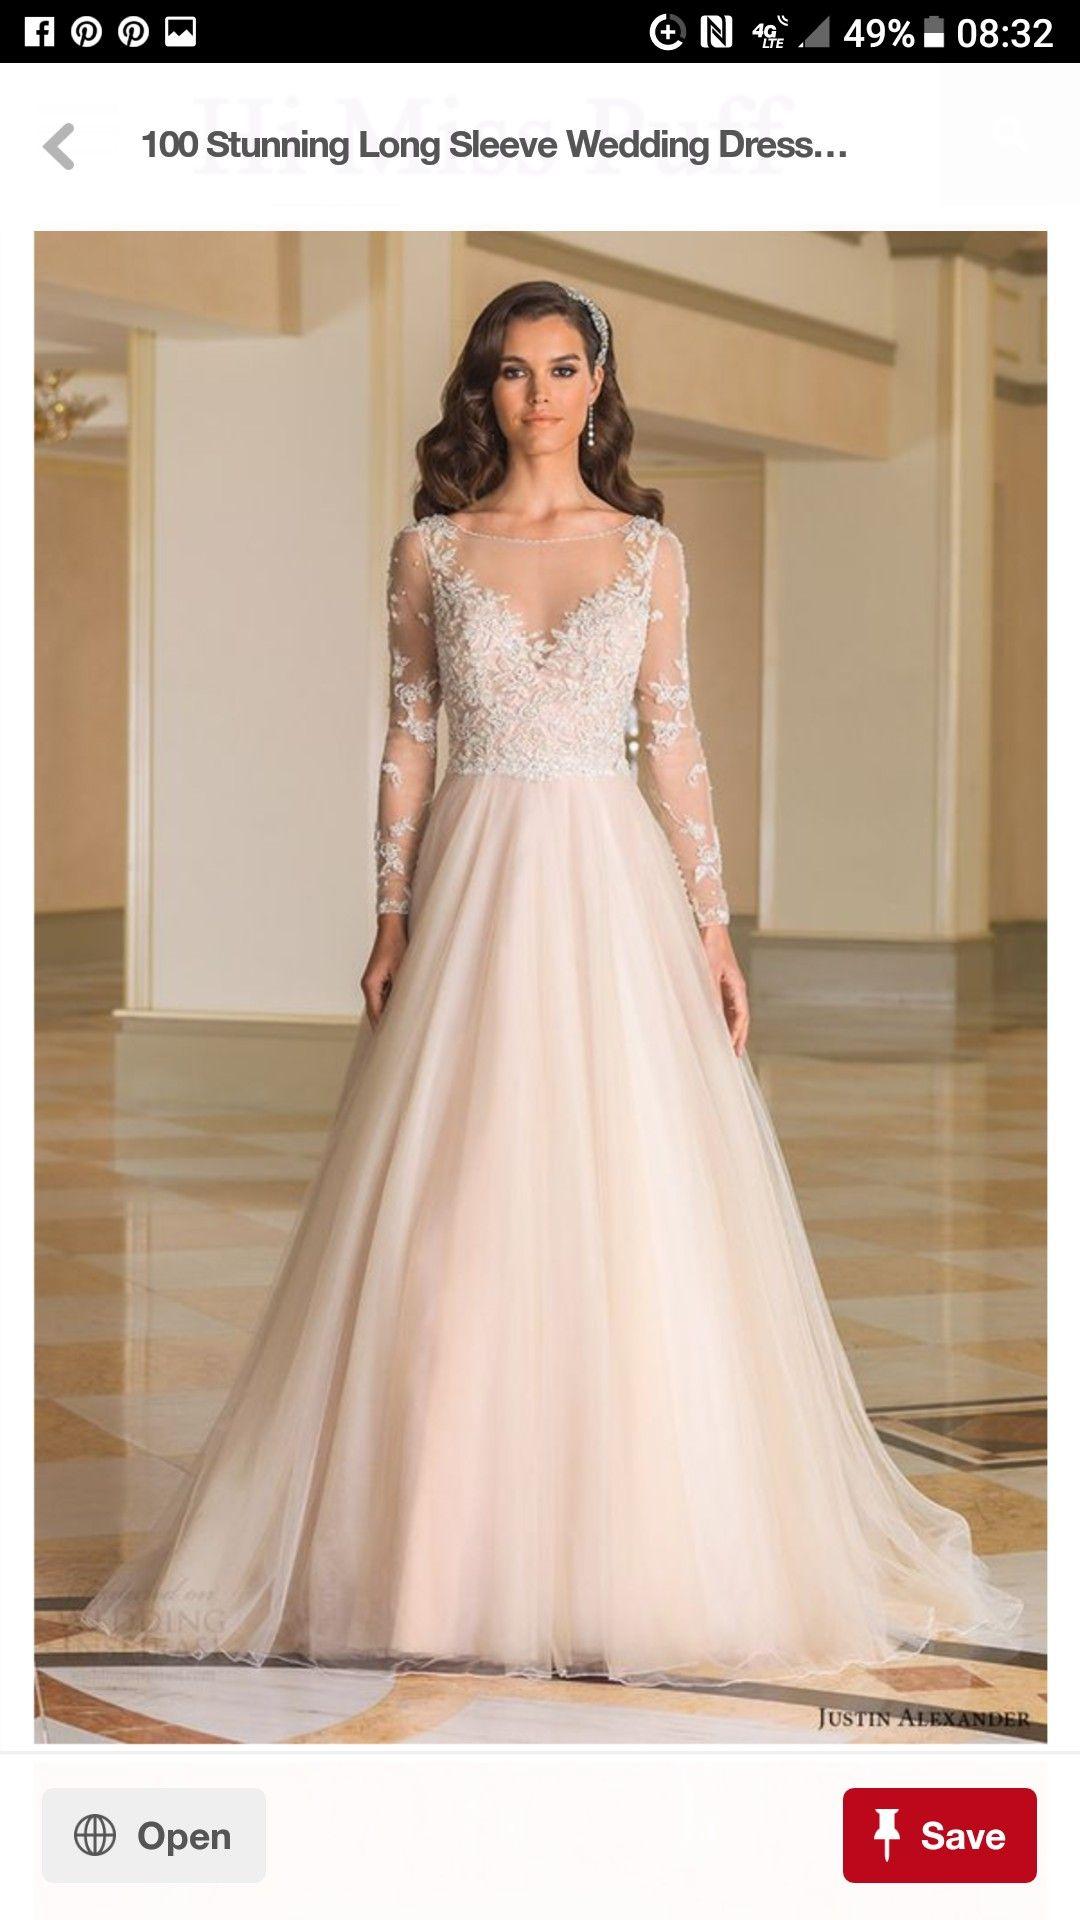 Pin by roseanna alokoa on wedding dress pinterest wedding dress